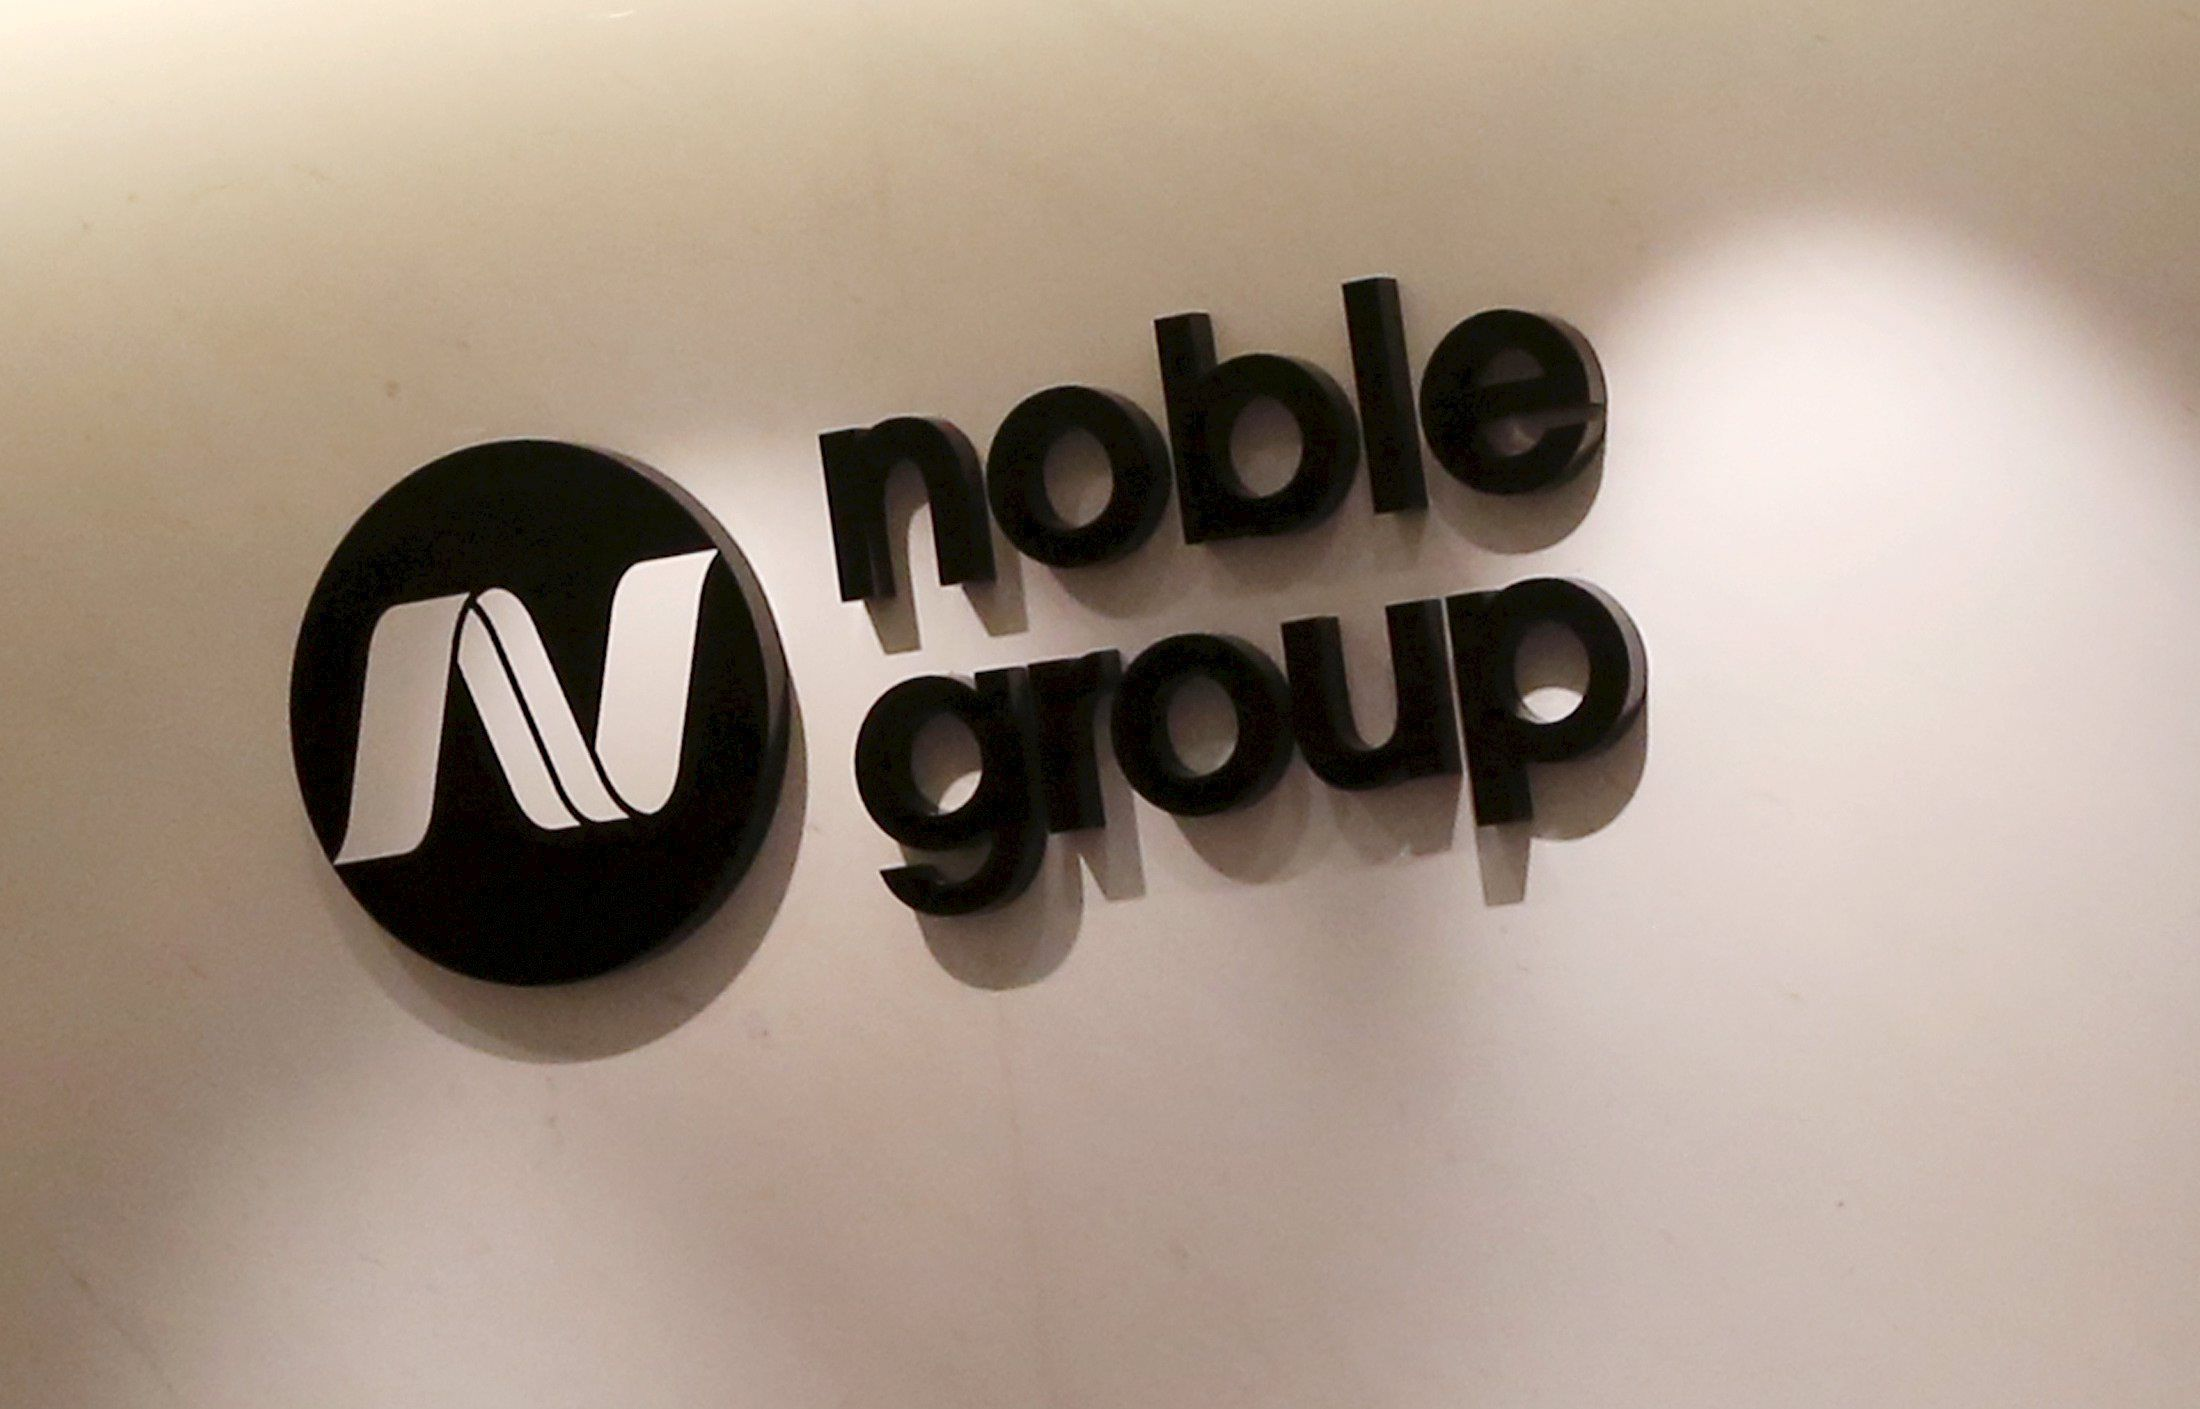 Noblegroup